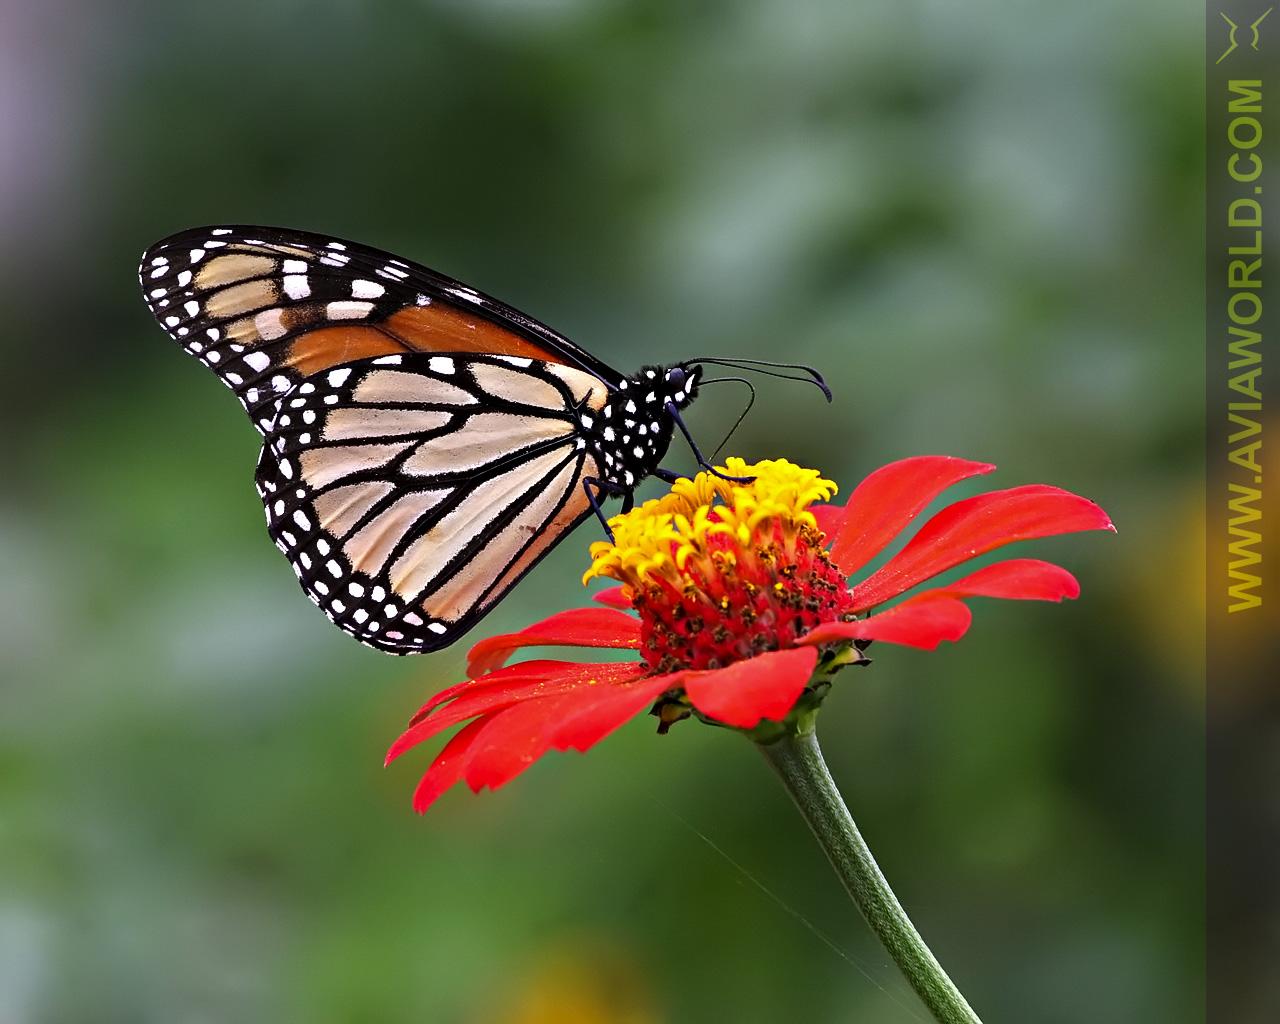 HD Animal Wallpapers HD Butterflies wallpapers 1280x1024